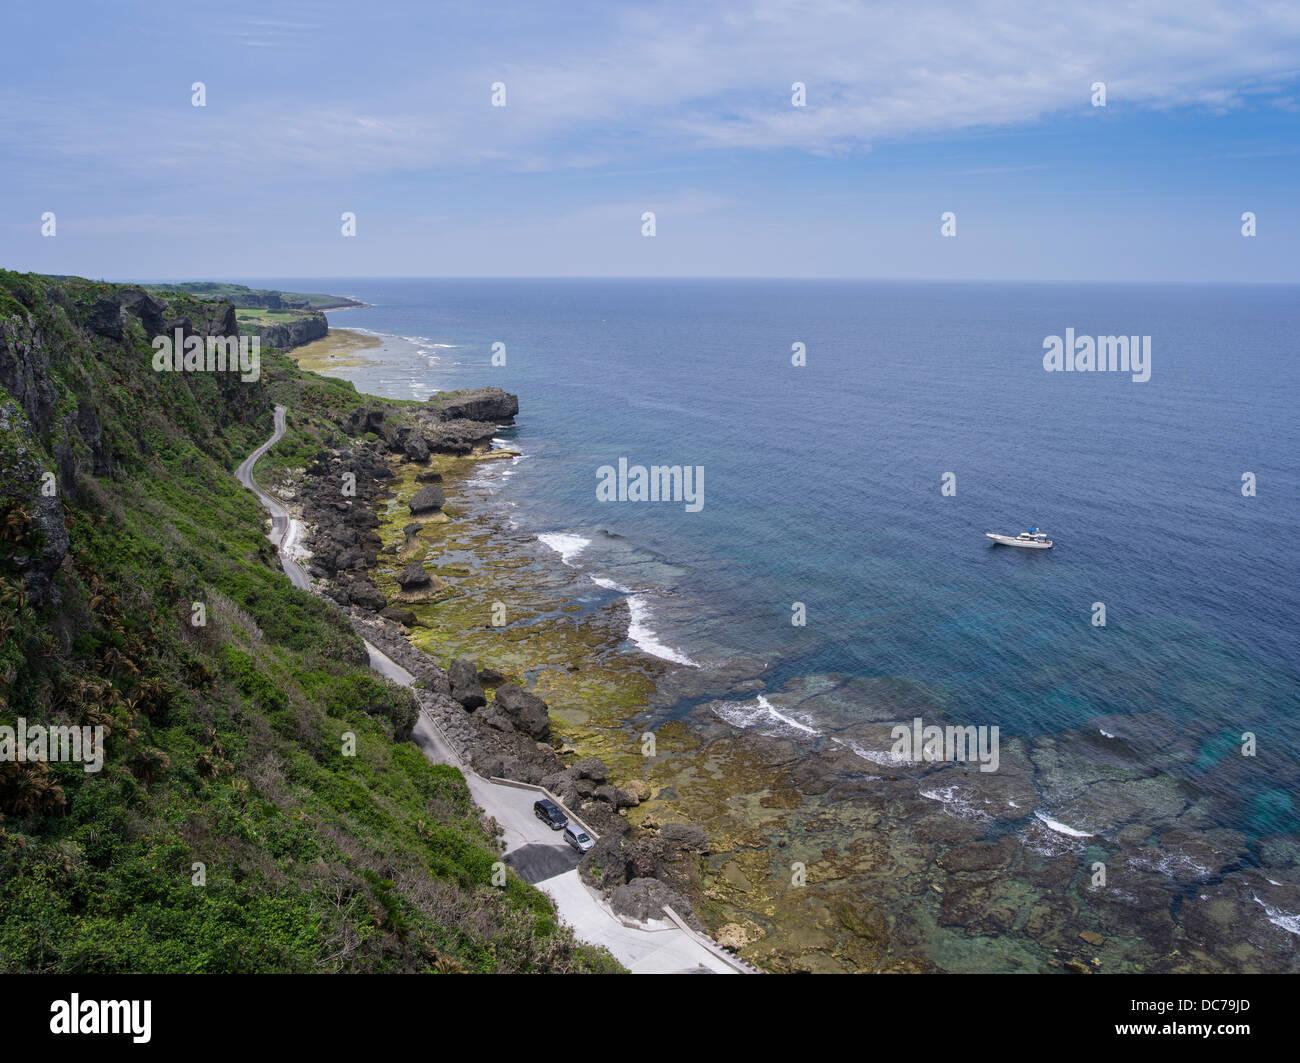 Wajee Sicht, D.h. Insel Okinawa, Japan Stockbild